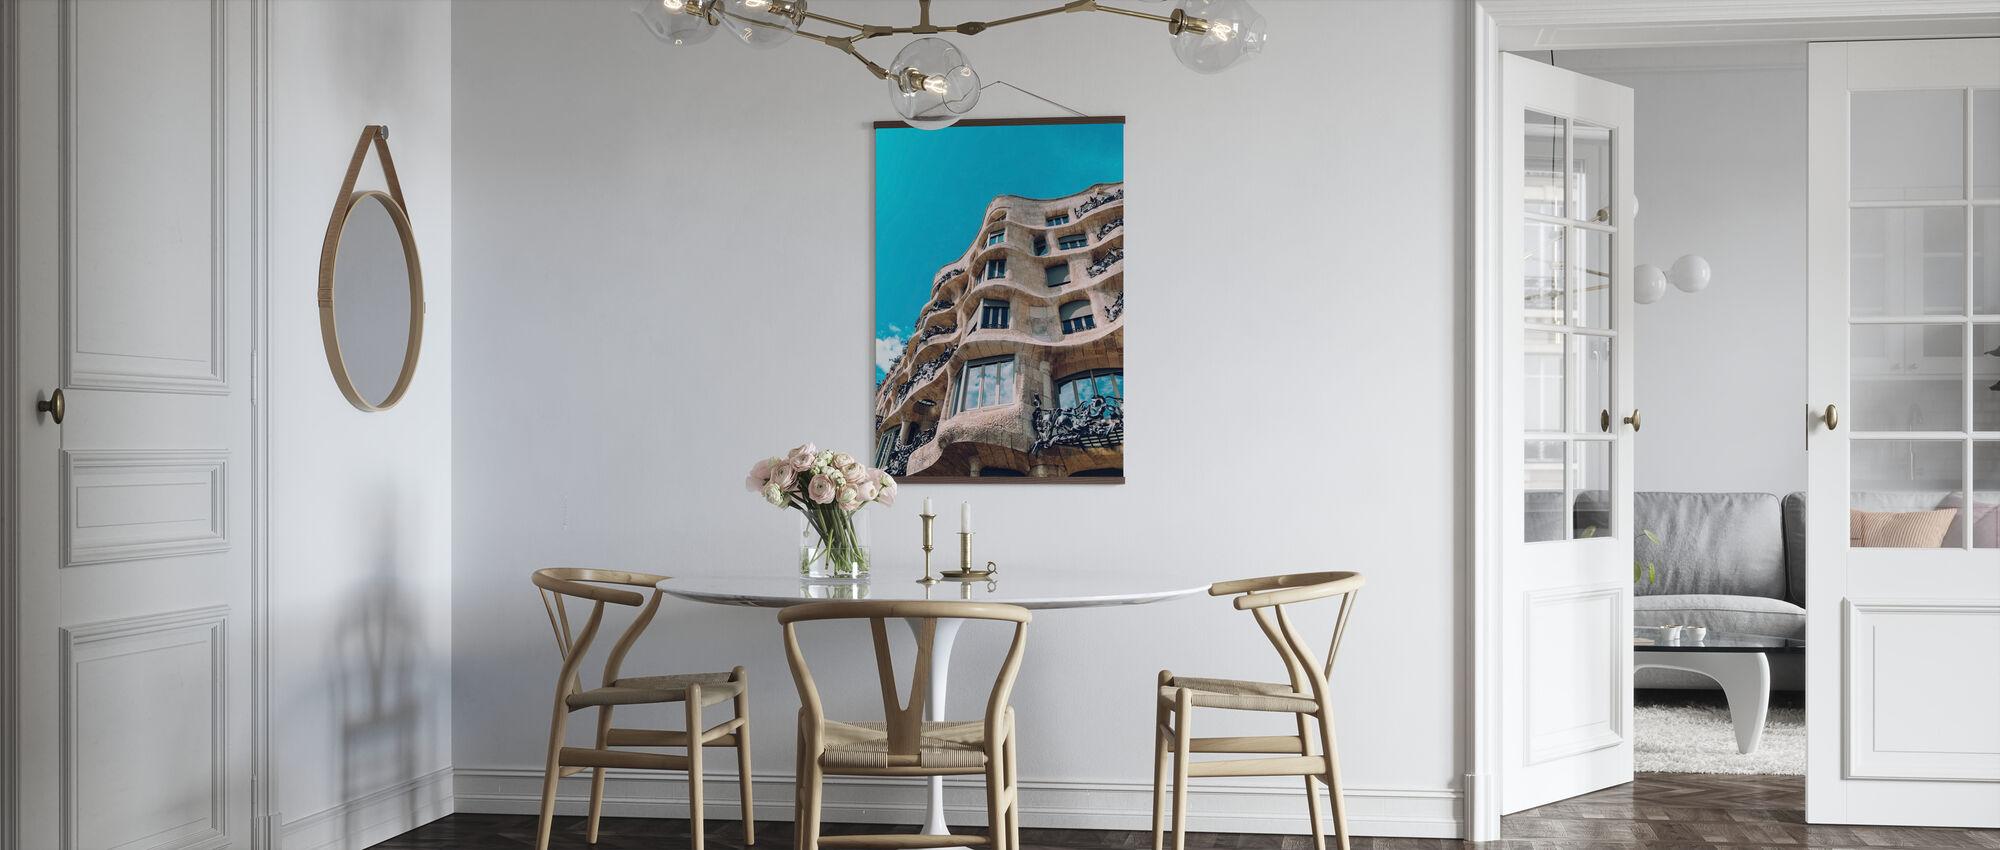 Casa Mila Building - Poster - Kitchen